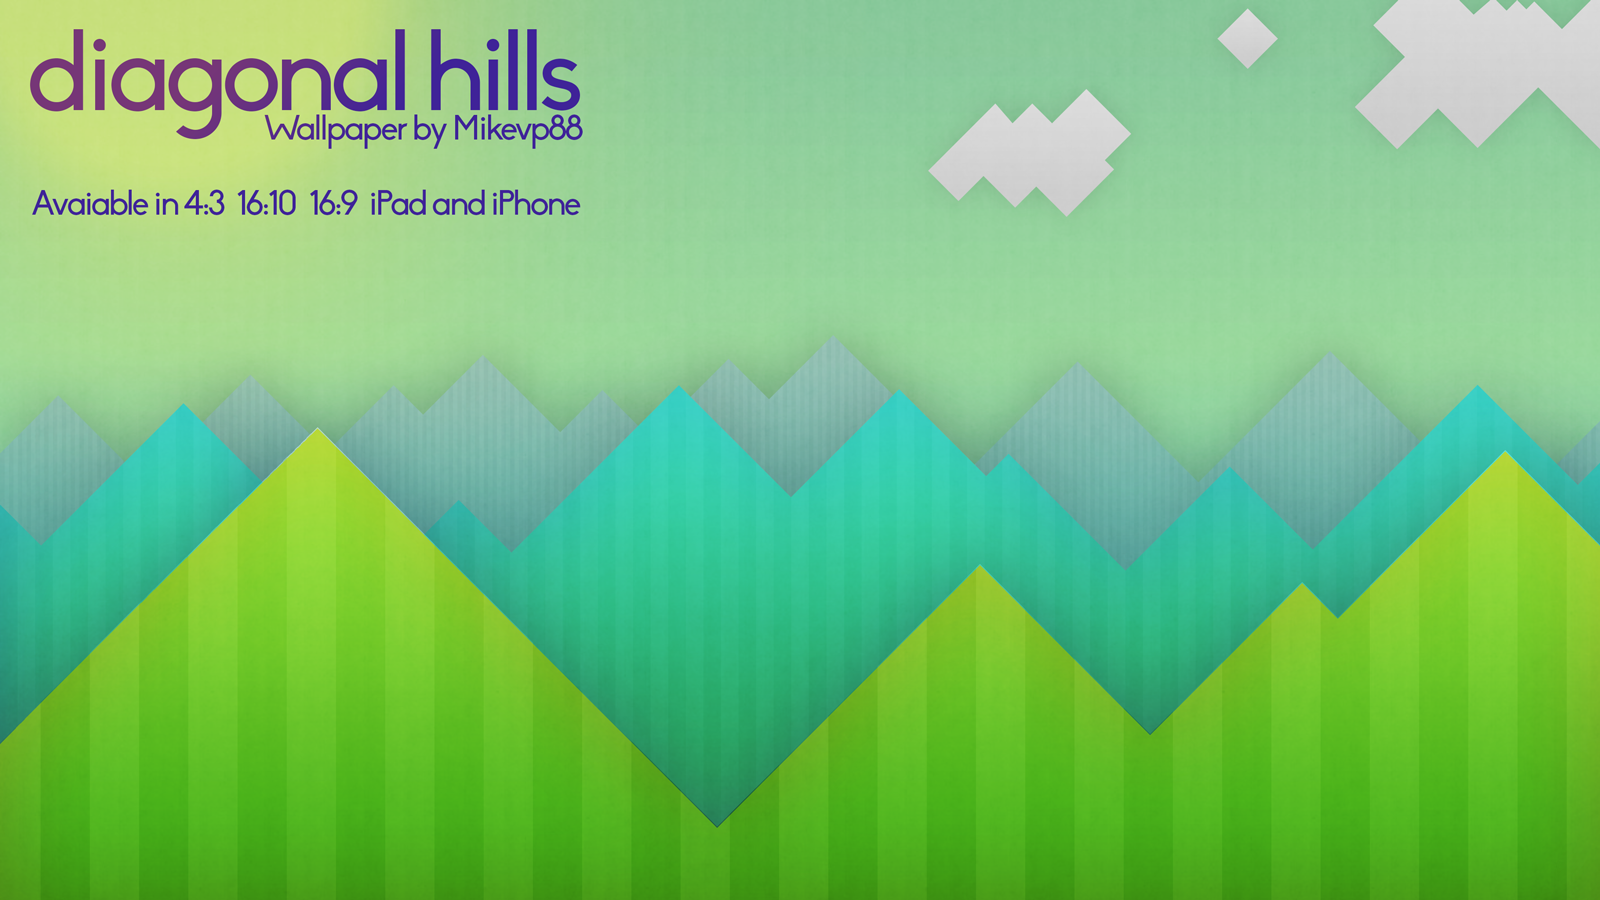 Diagonal Hills Wallpaper by MikeMovies